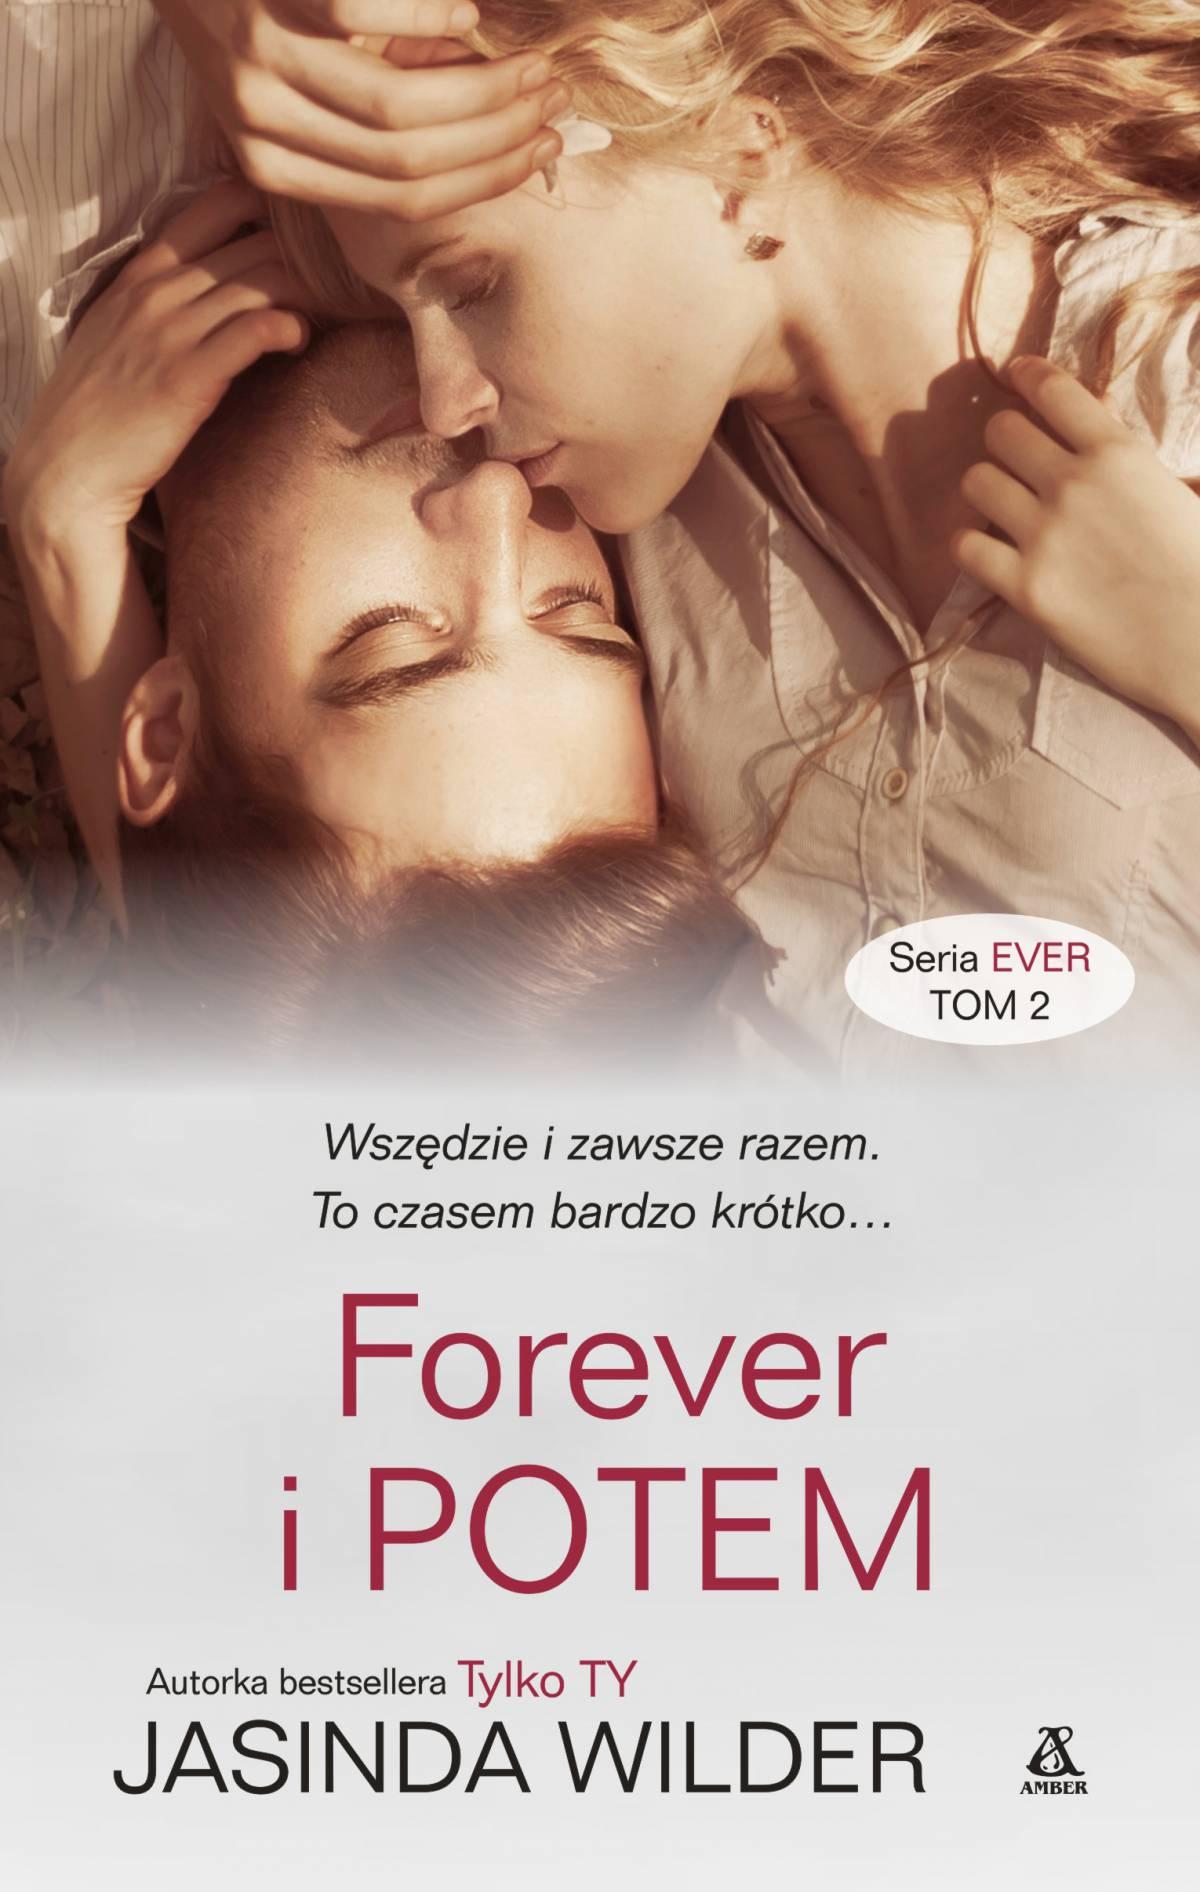 Forever i potem - Ebook (Książka EPUB) do pobrania w formacie EPUB